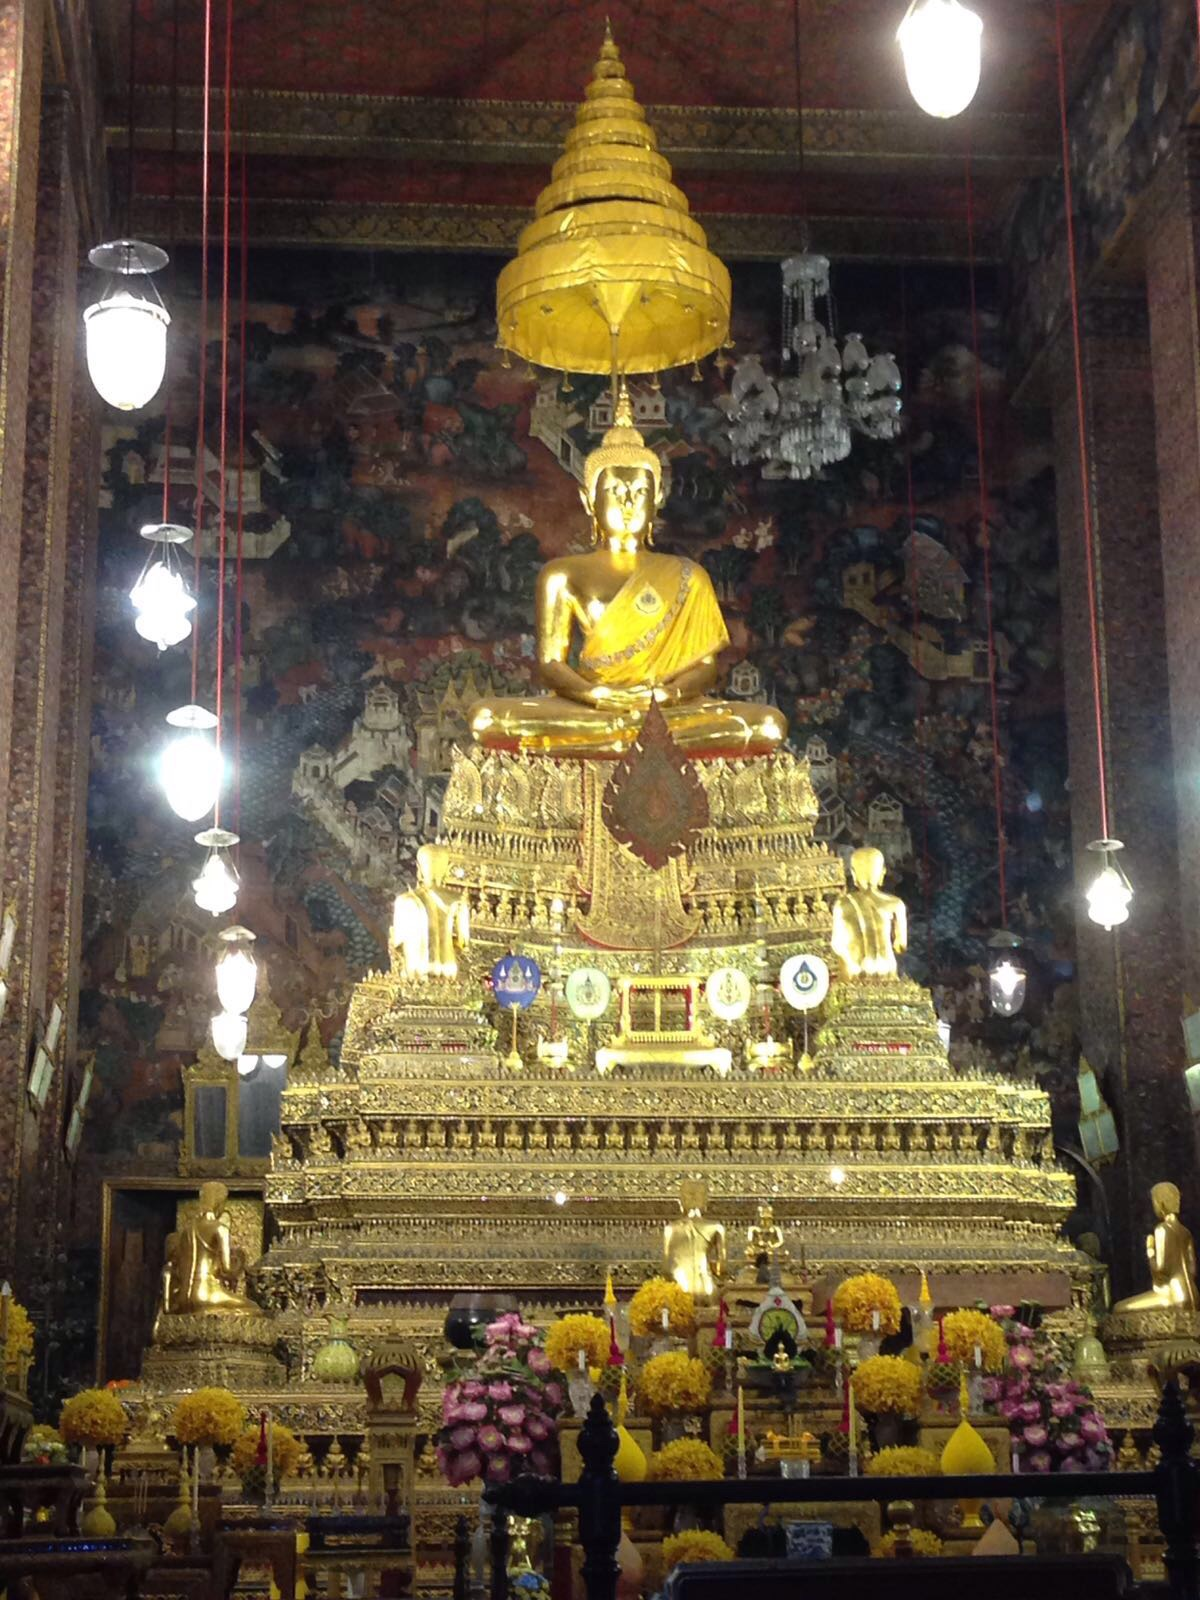 The Gold Buddah